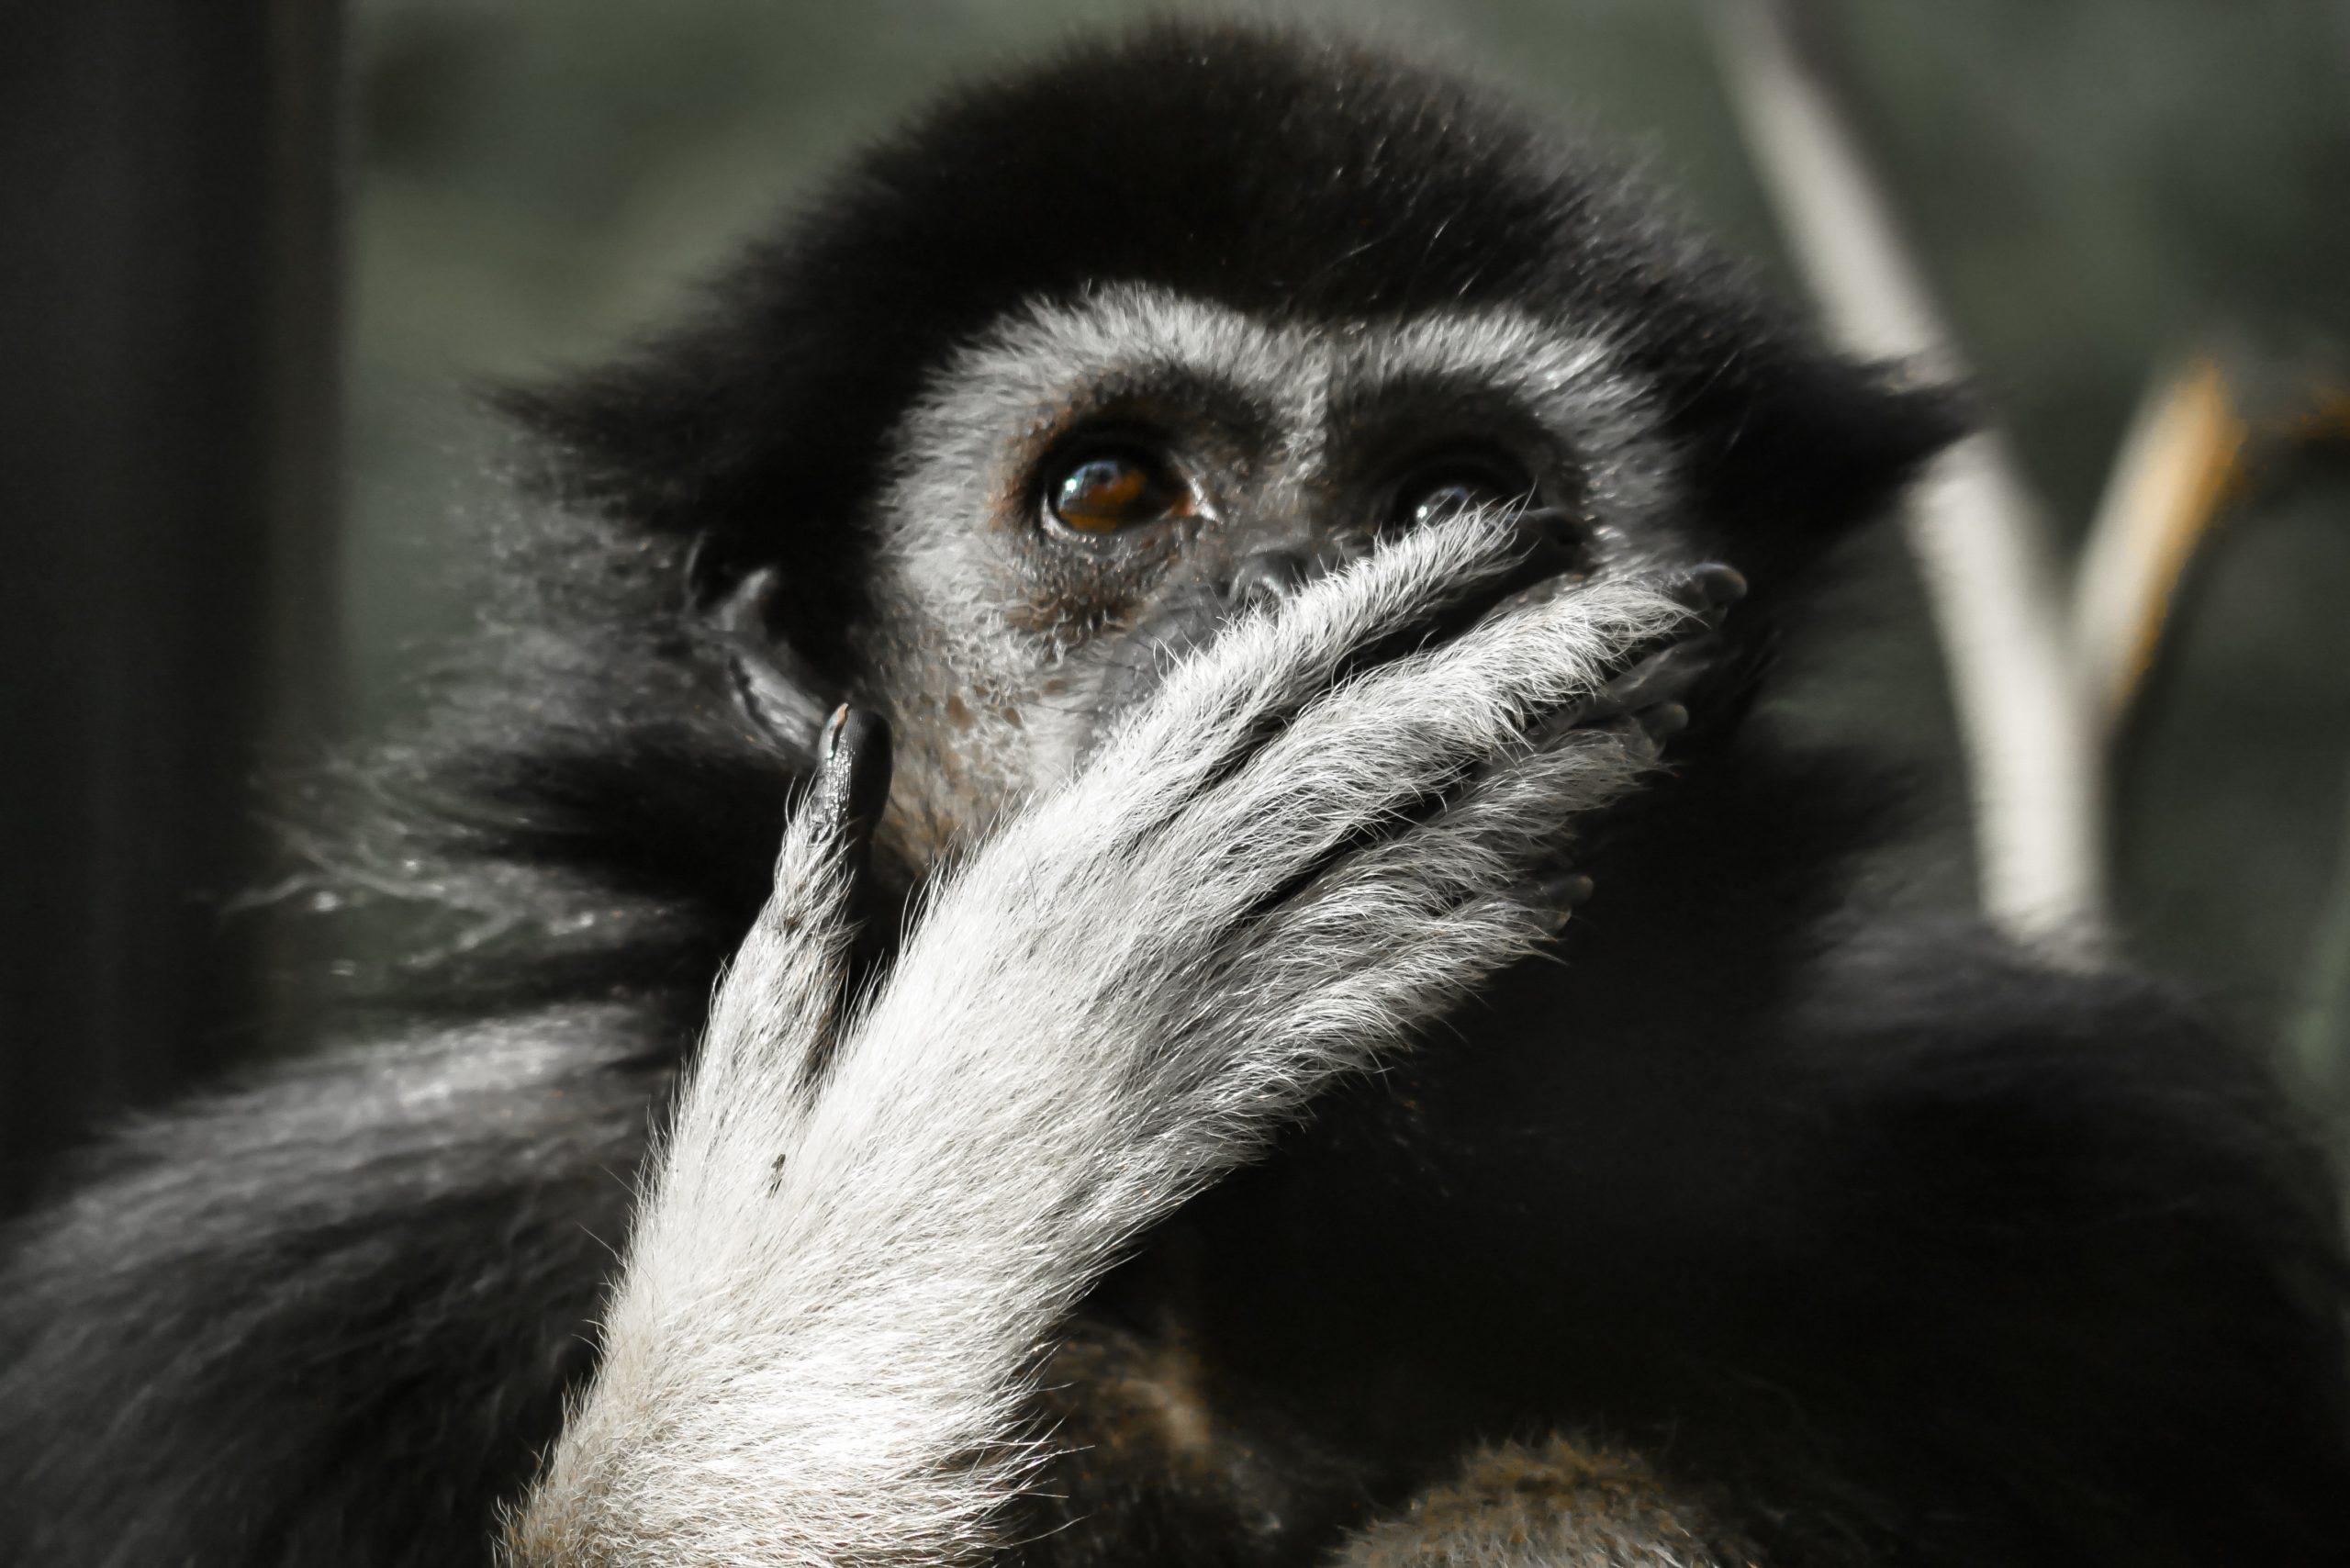 gibbon_noir_tête_singe_primate_thailande_asie